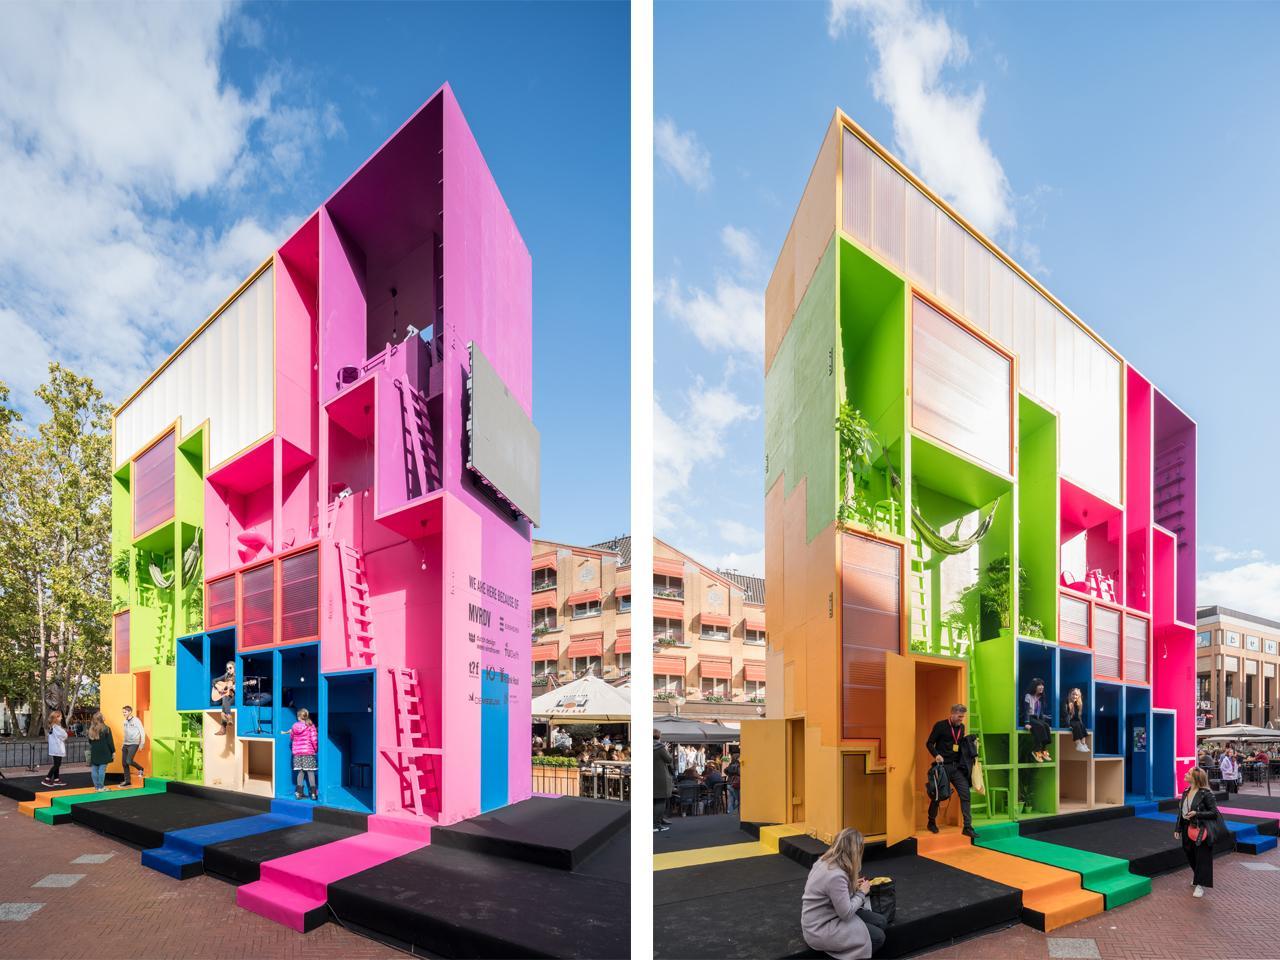 Dutch architecture firm MVRDV is no stranger to thinking outside the box